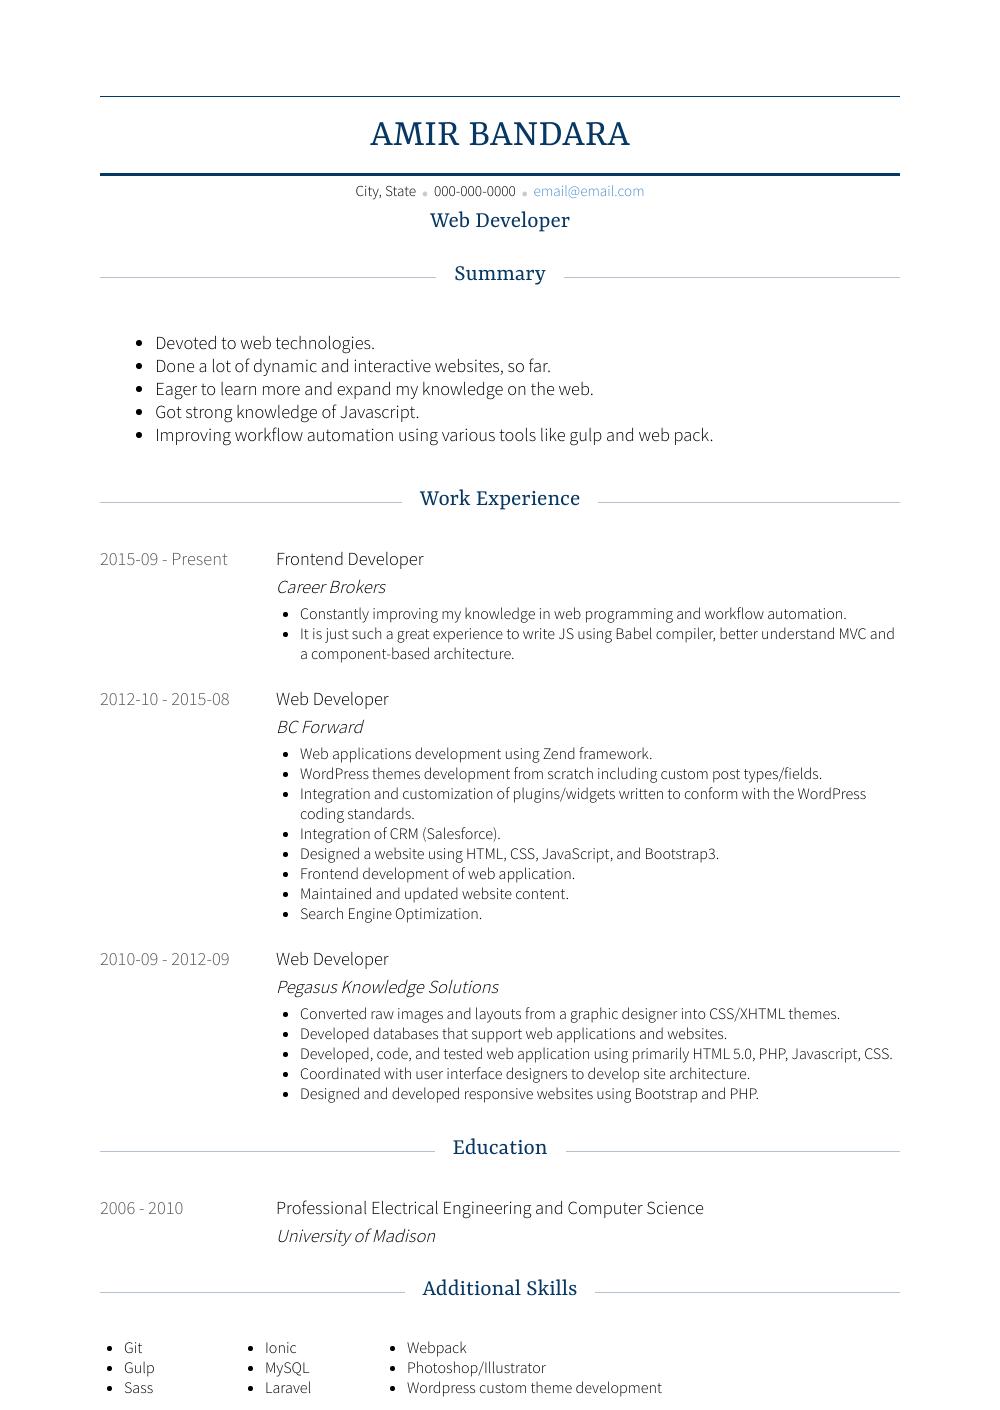 Web Developer Resume Sample and Template